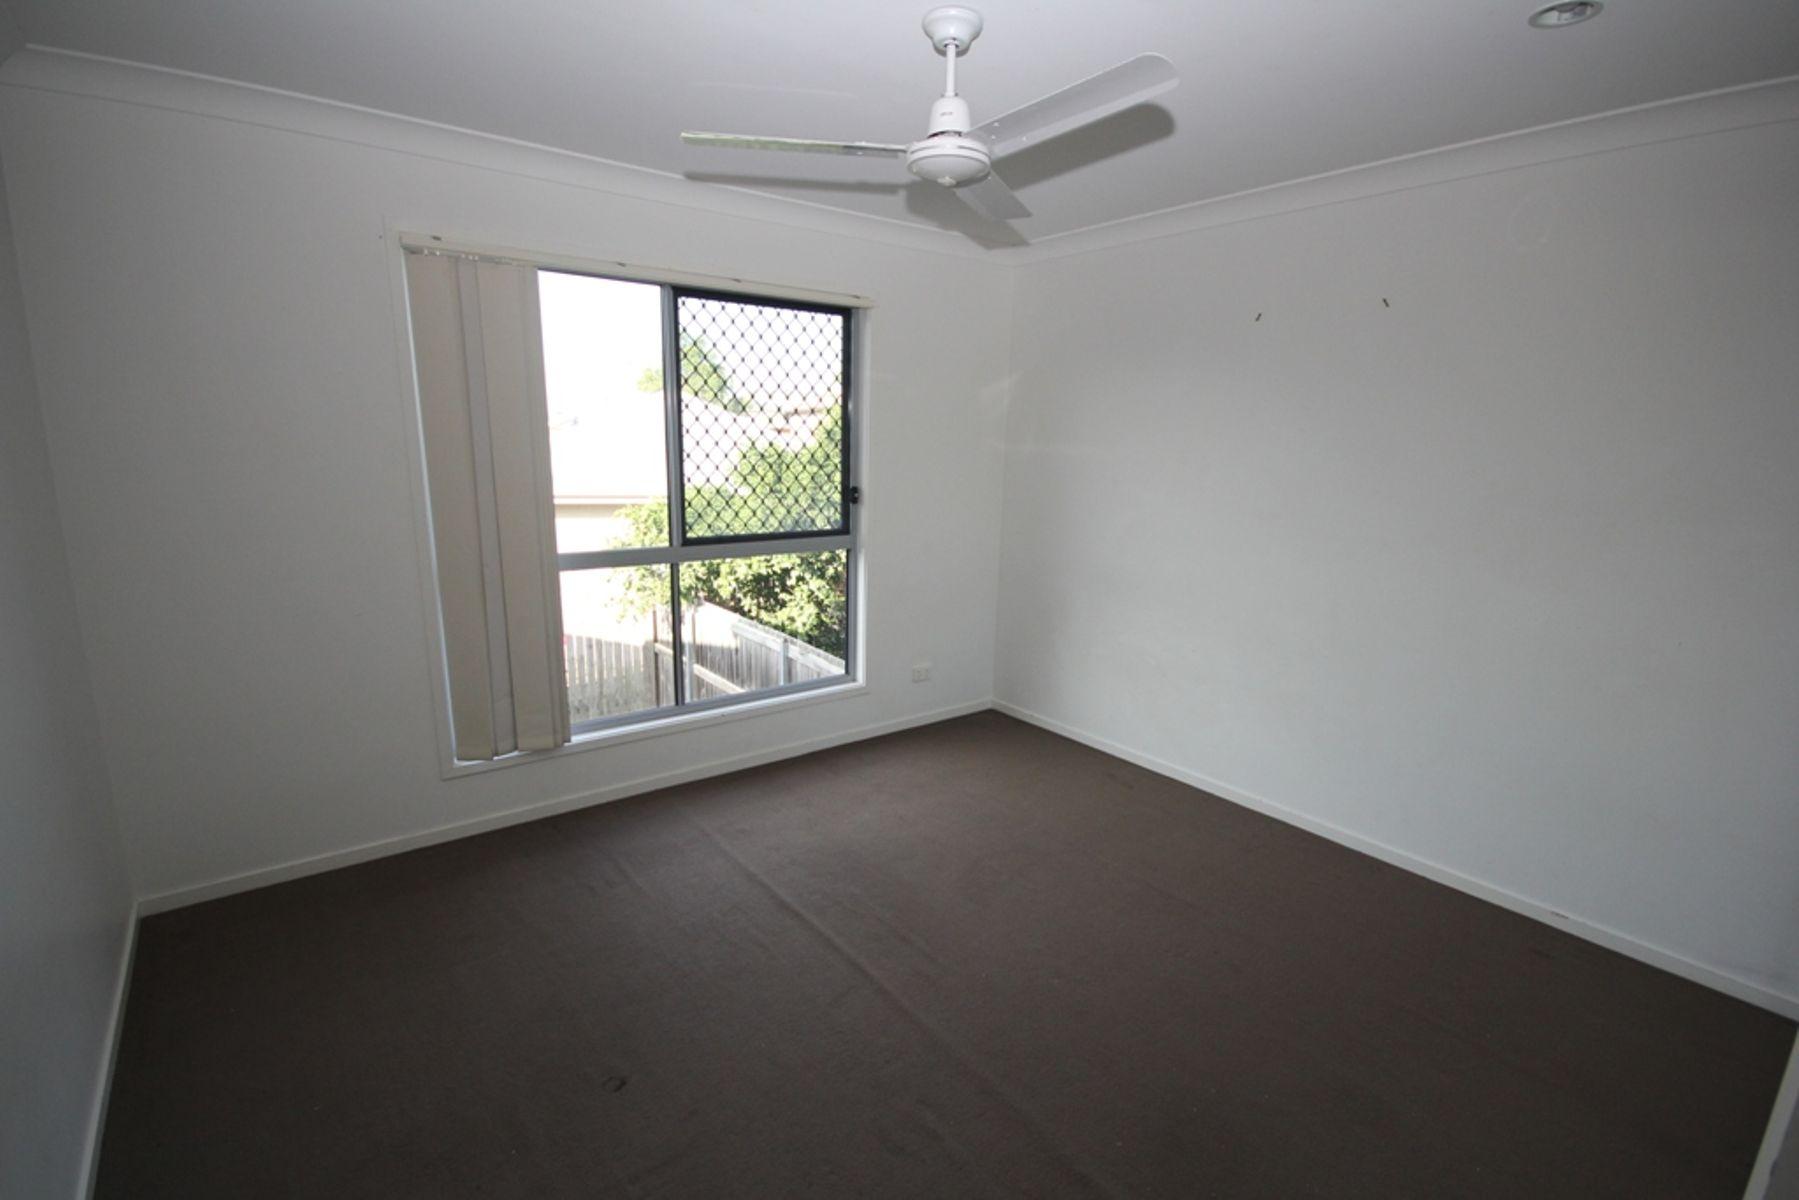 10 Kinglake Avenue, Springfield Lakes, QLD 4300